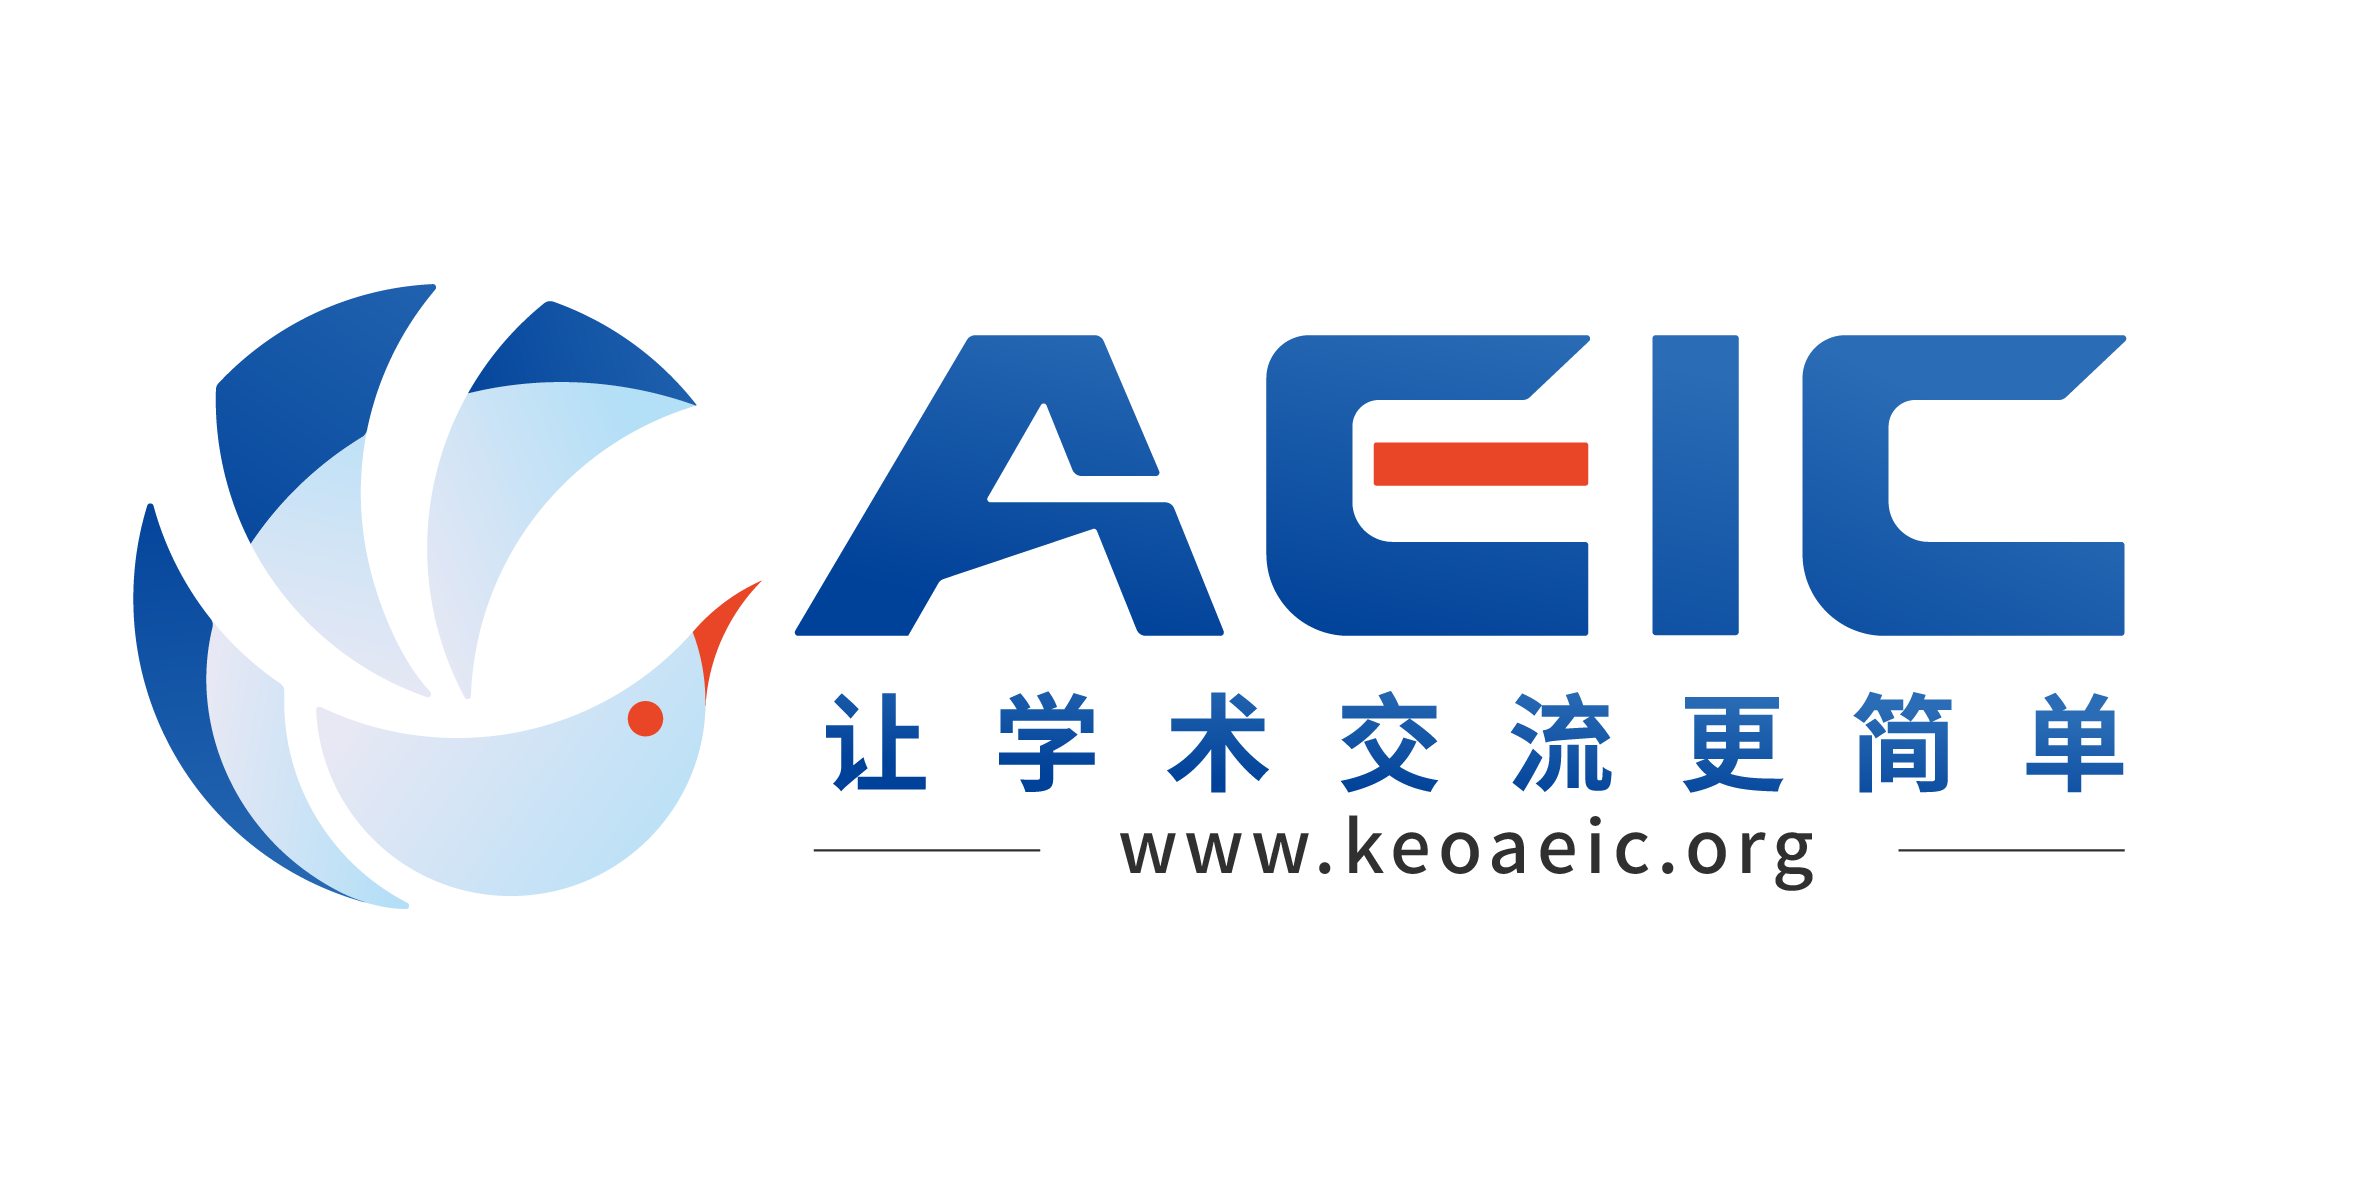 AEIC标志与简称&网址组合-01.png